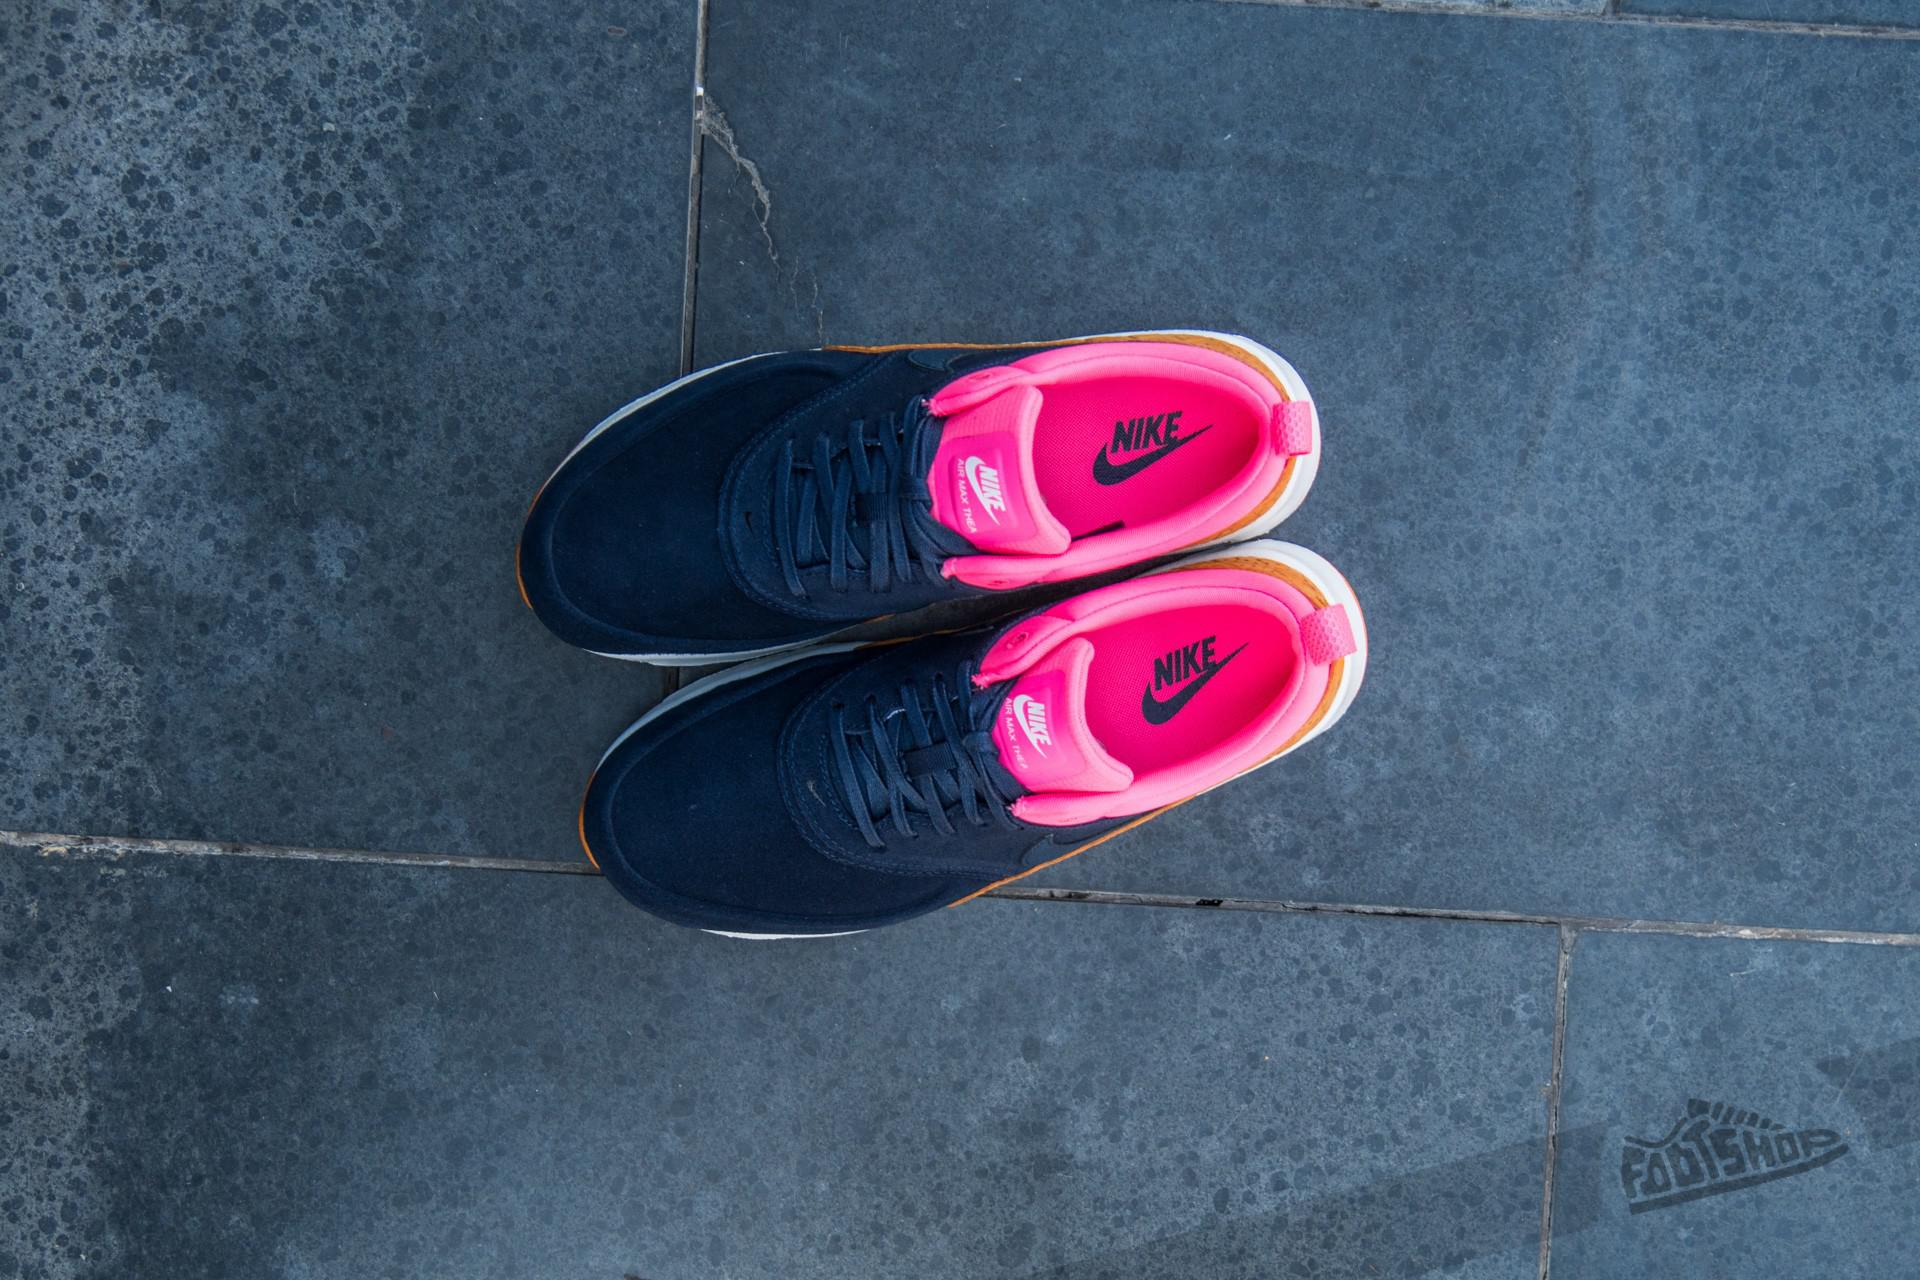 Nike W Air Max Thea Premium Leather Obsidian Obsidian